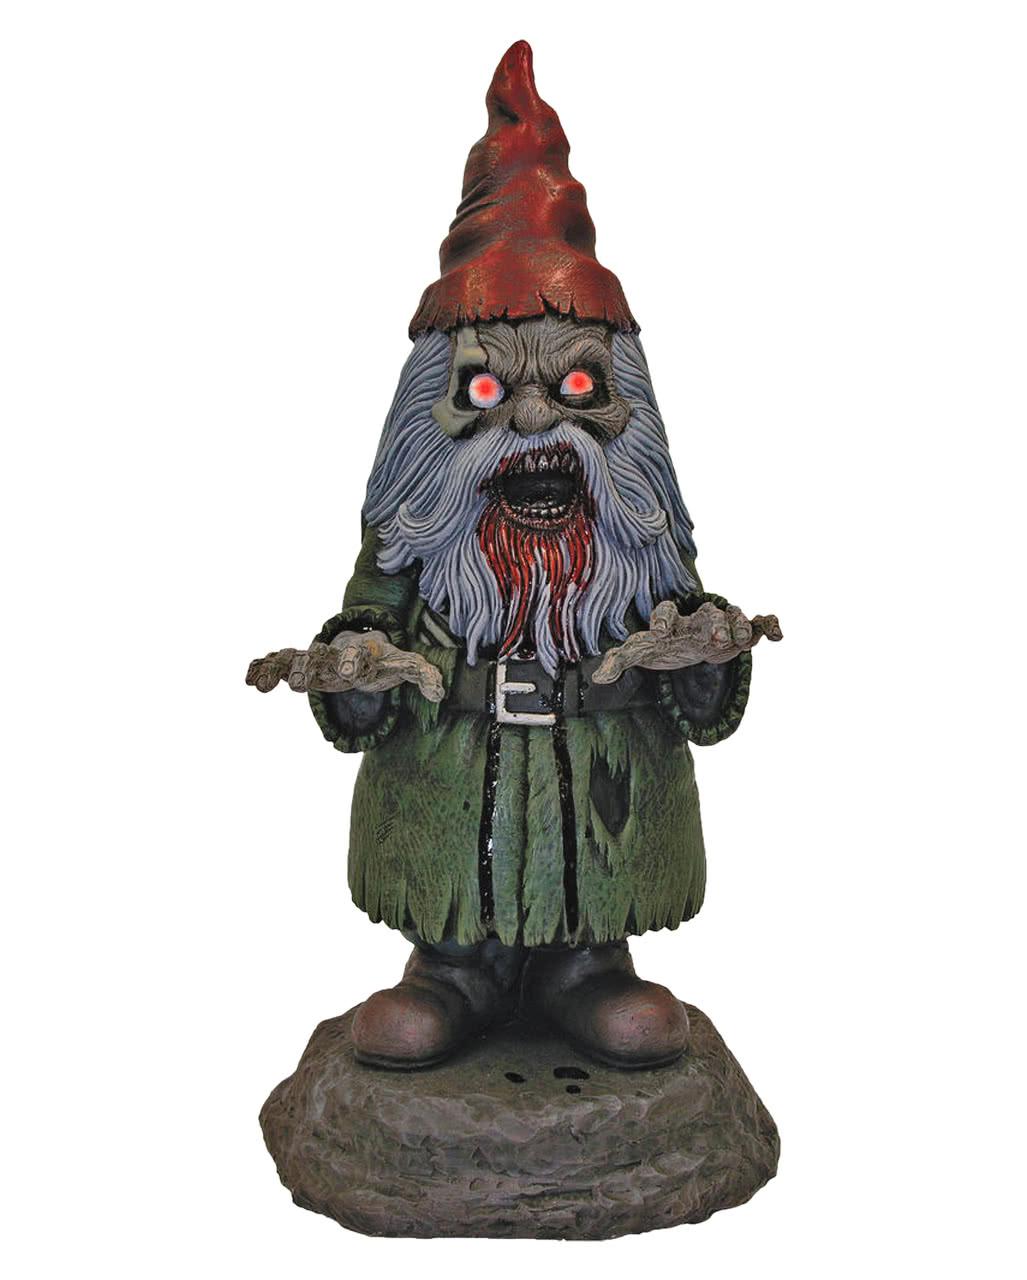 Horror Gartenzwerg Mit Led Augen Halloween Deko Horror Shop Com